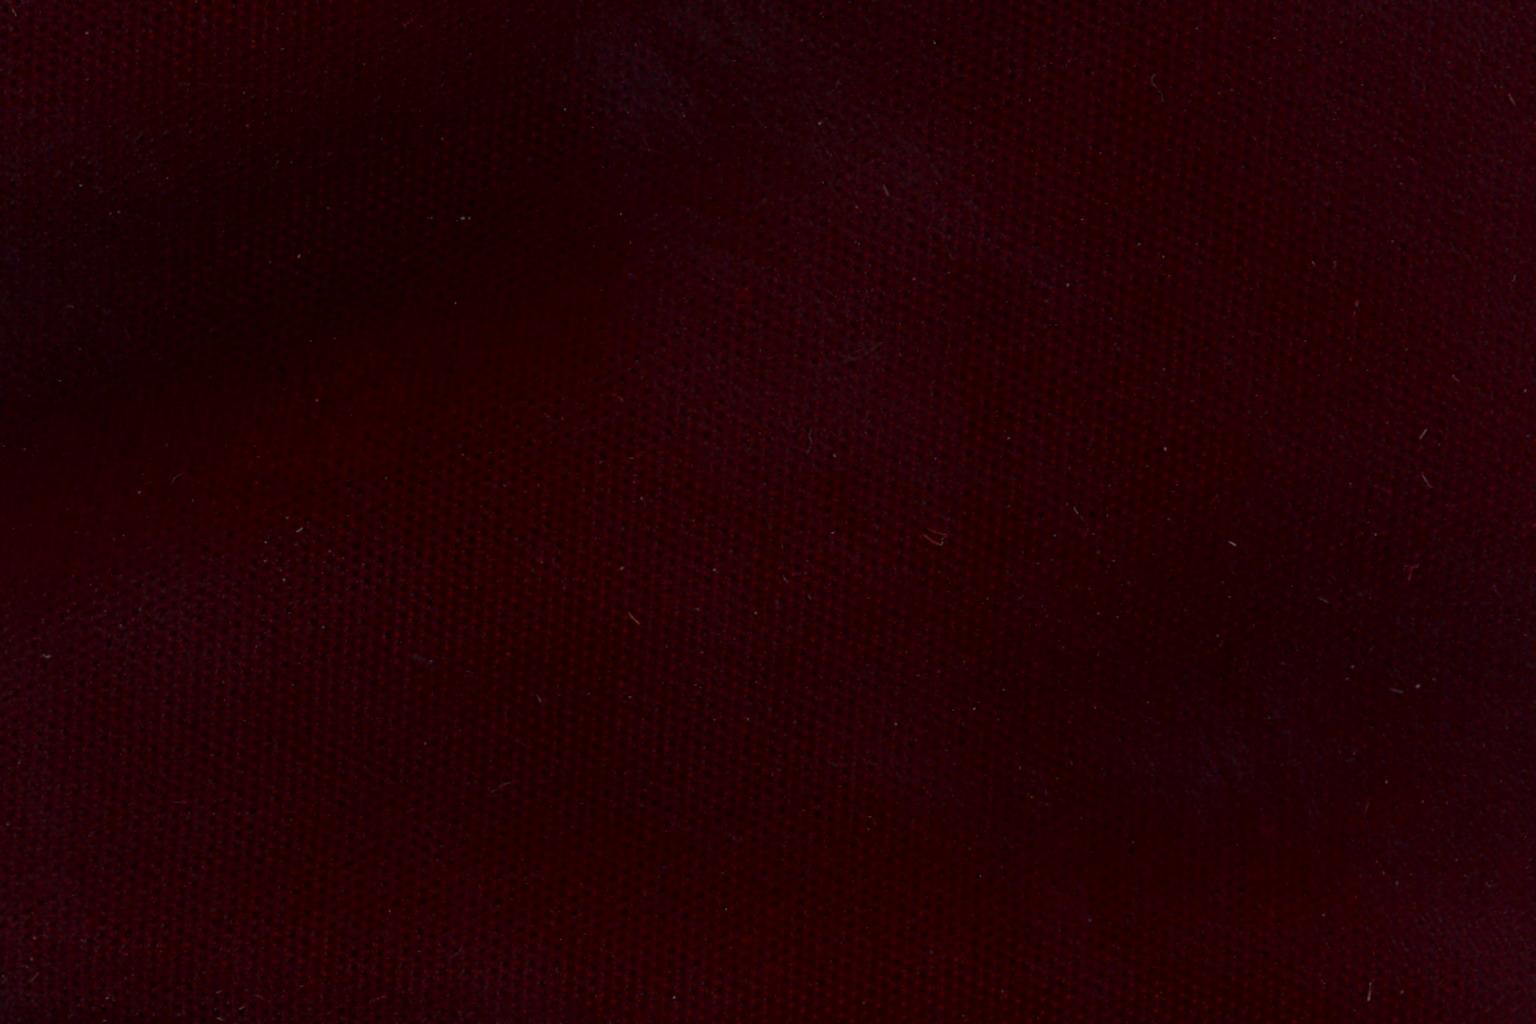 DOGE Dark Red